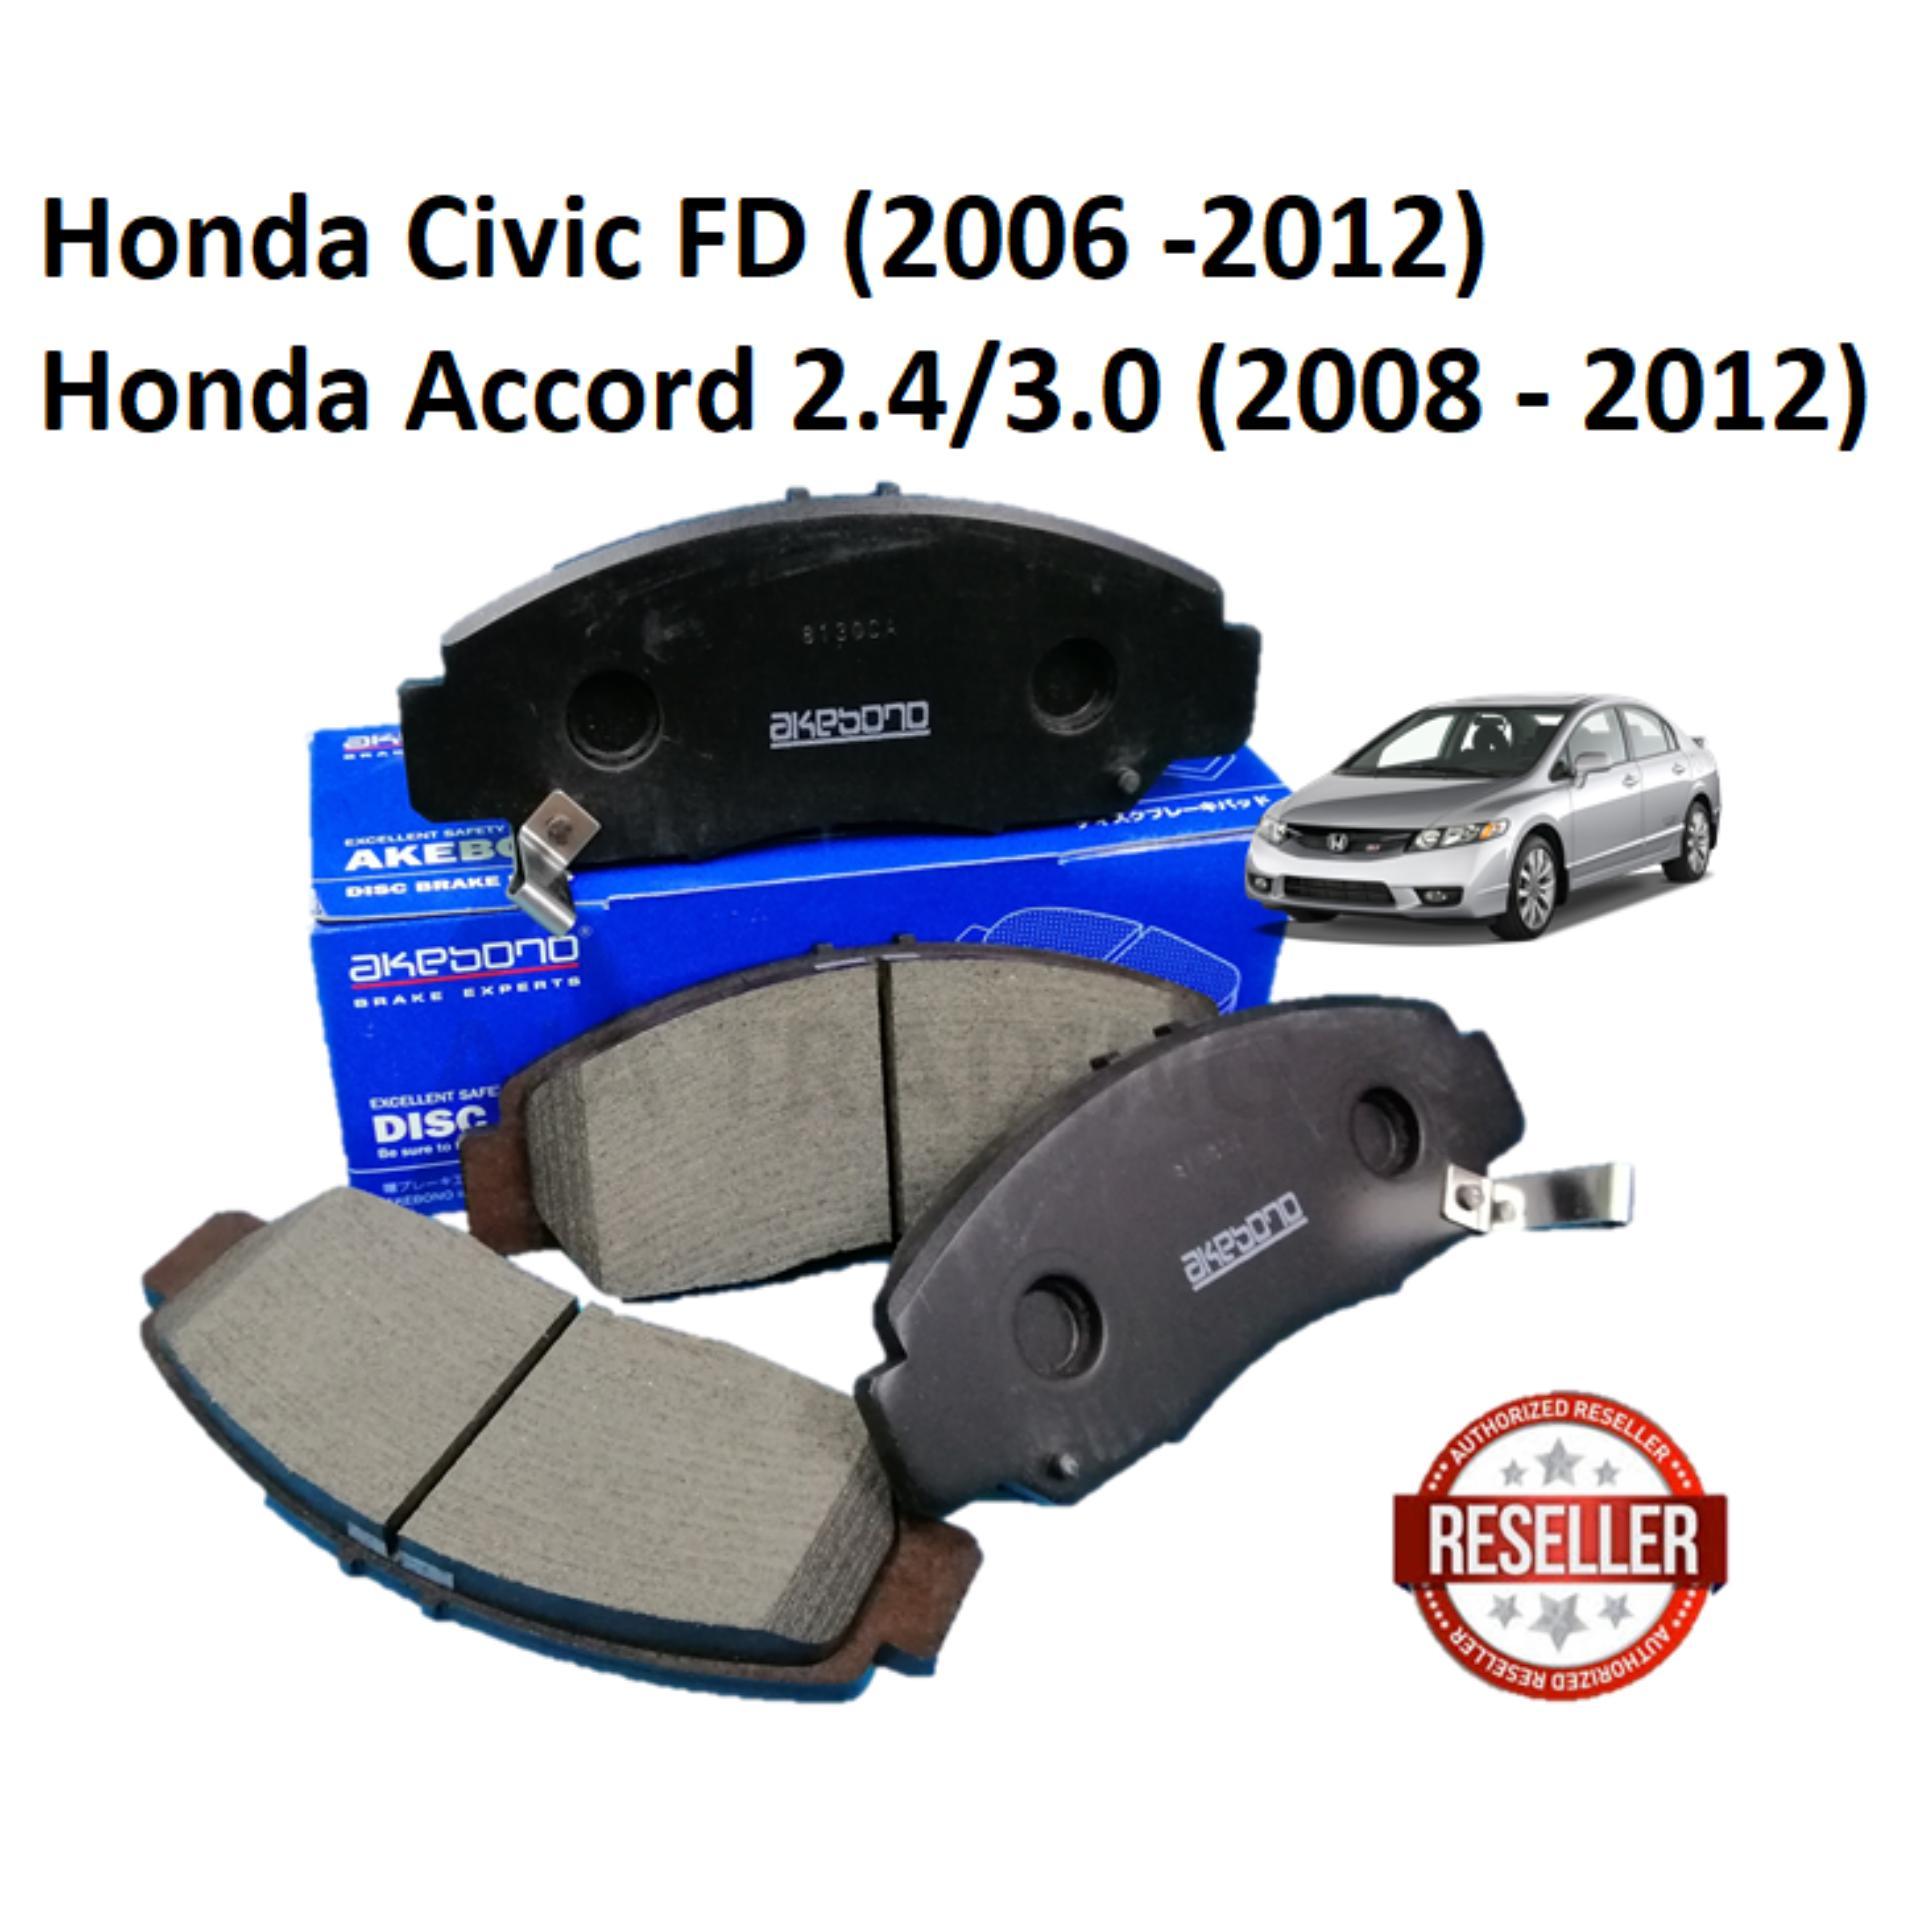 Genuine Akebono Front Brake Pads for Honda Civic FD (2006 - 2012), Honda  Accord 2 4/3 0 (2008 - 2012)